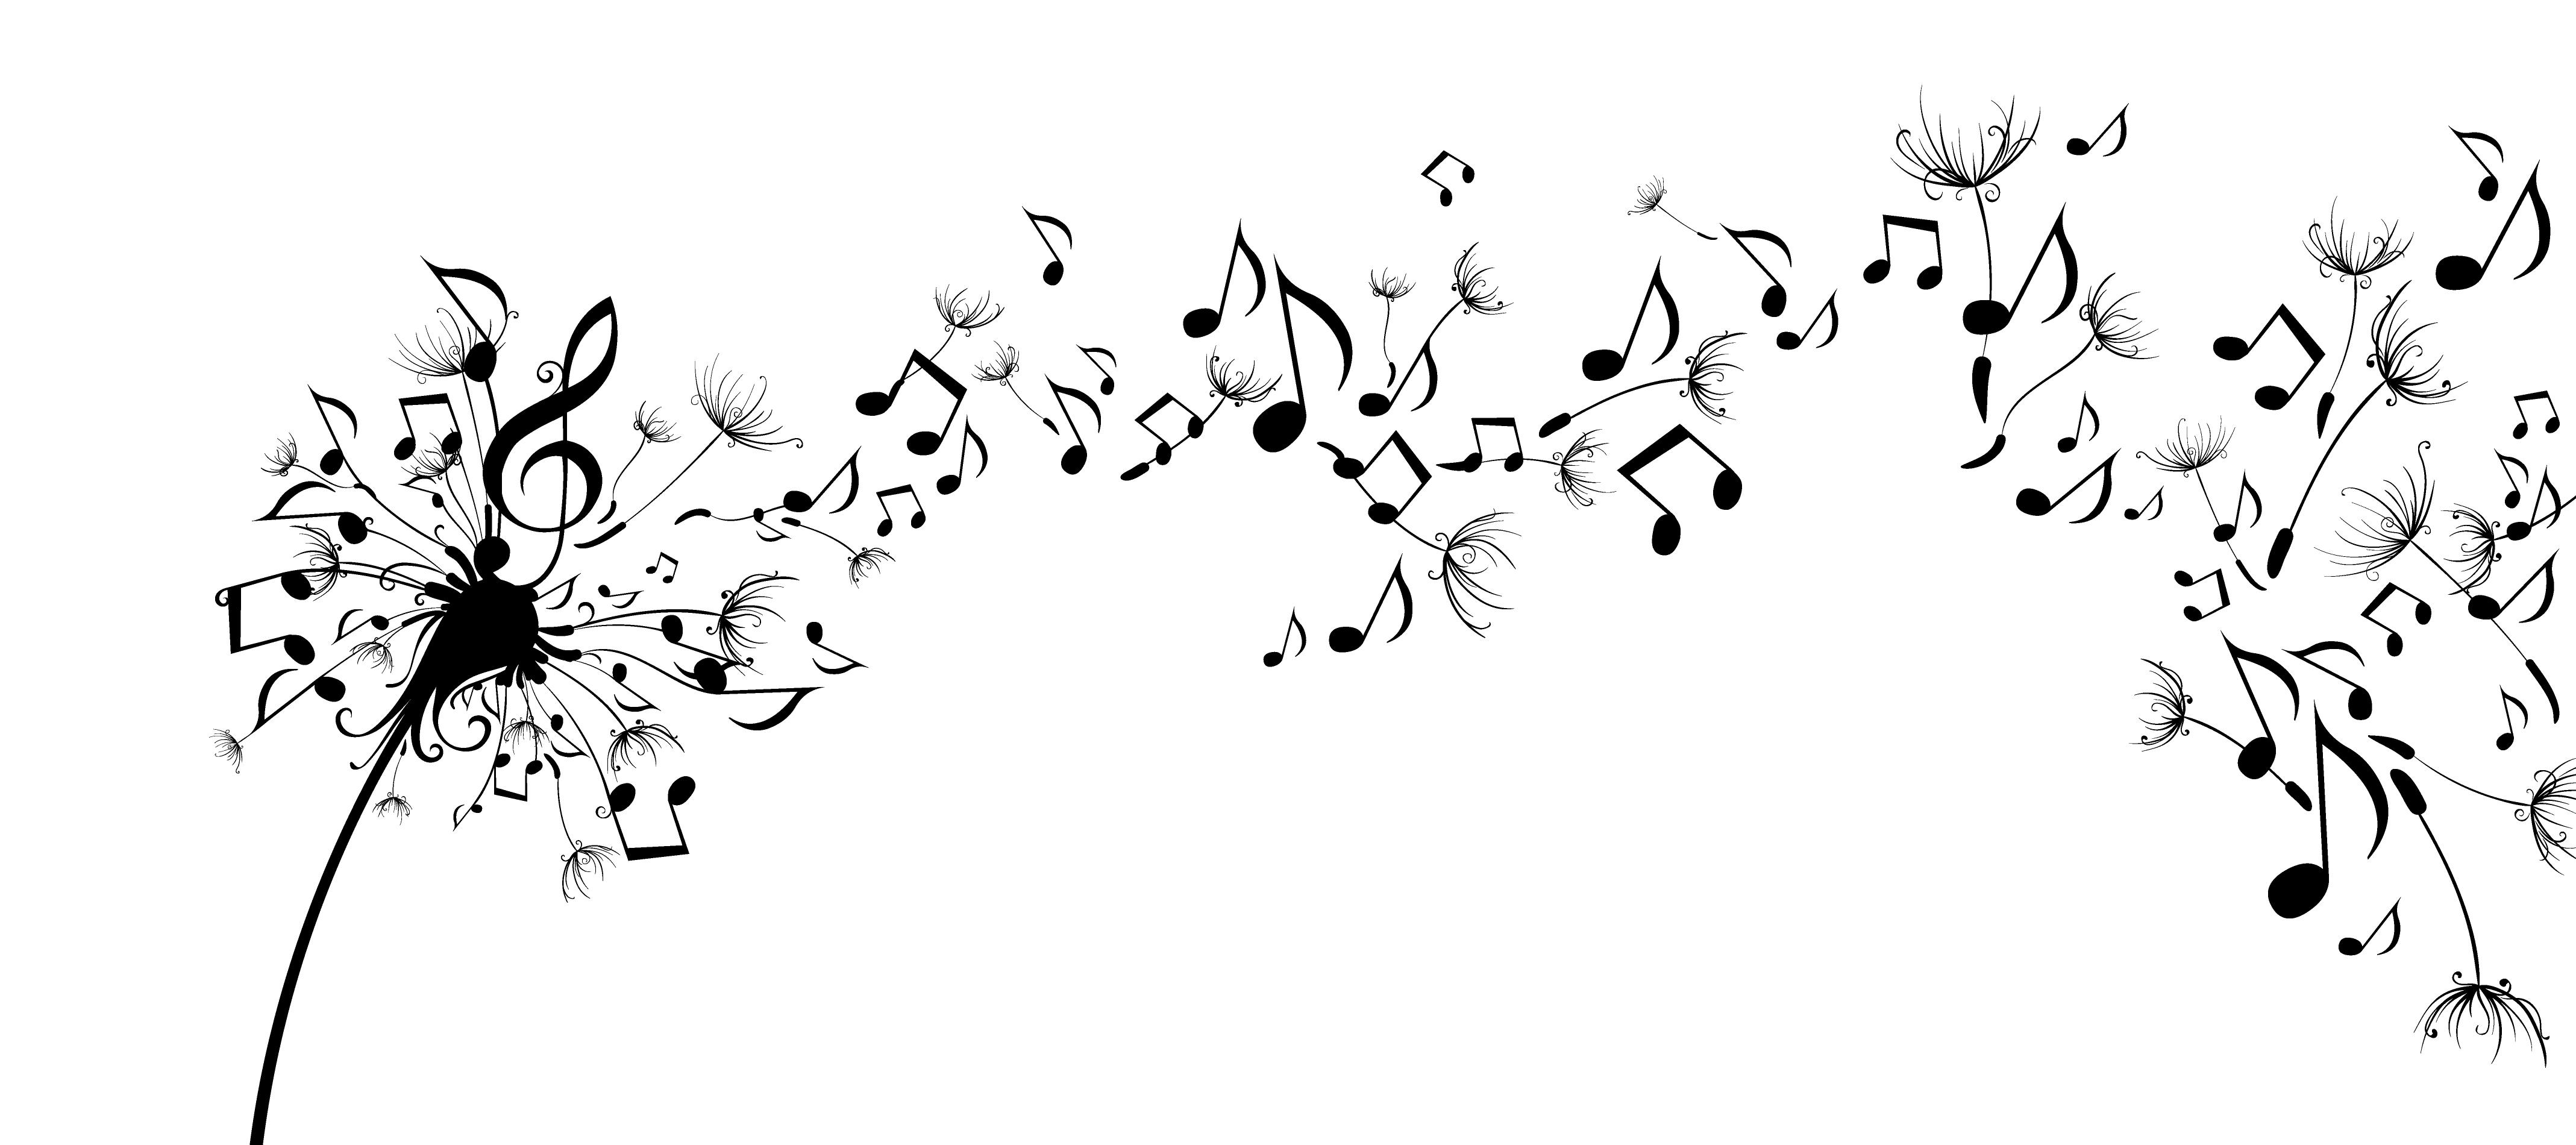 Summer Music in CNY